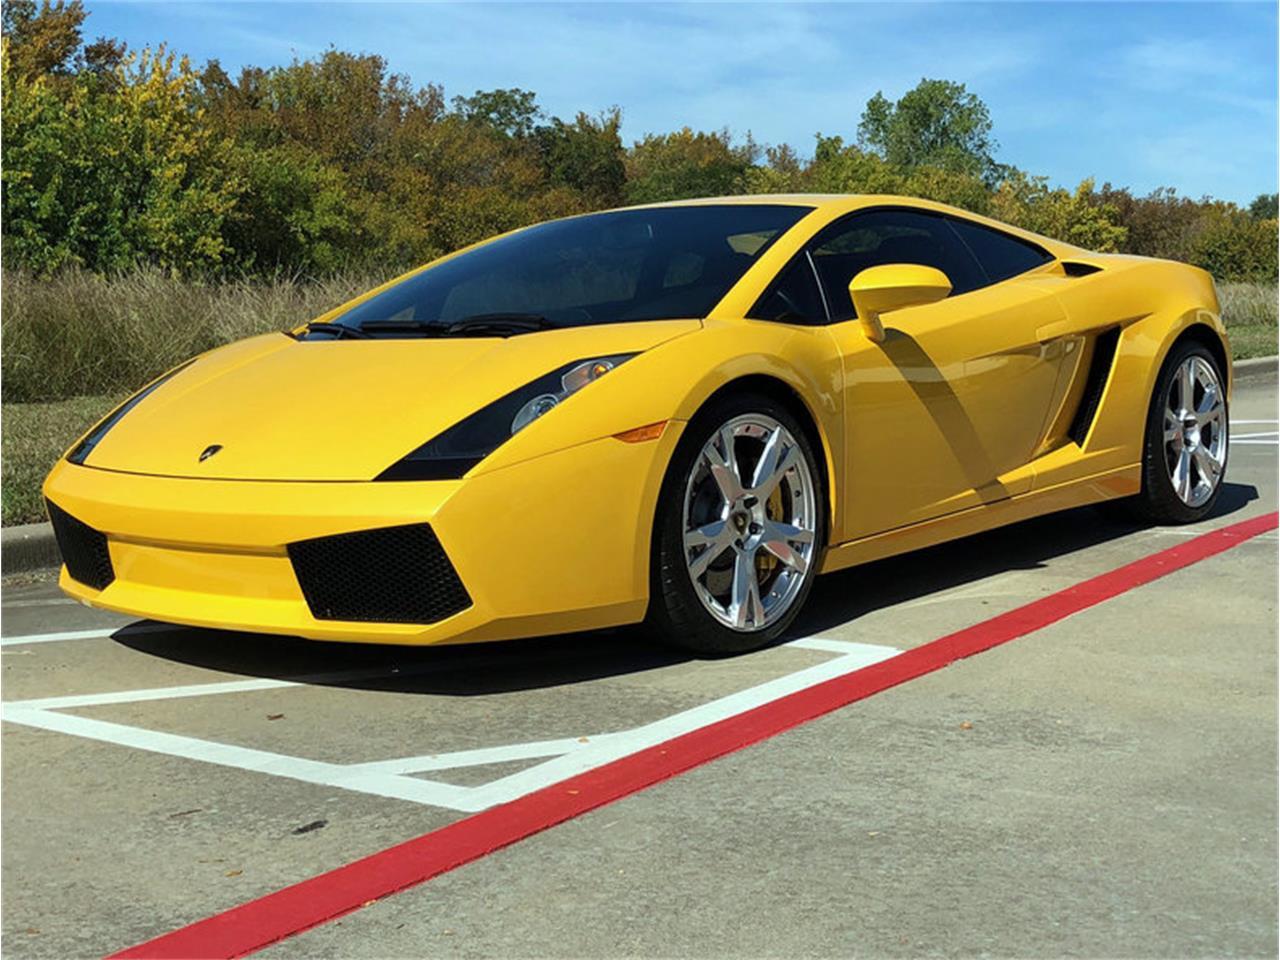 2008 Lamborghini Gallardo For Sale Classiccars Com Cc 1160201